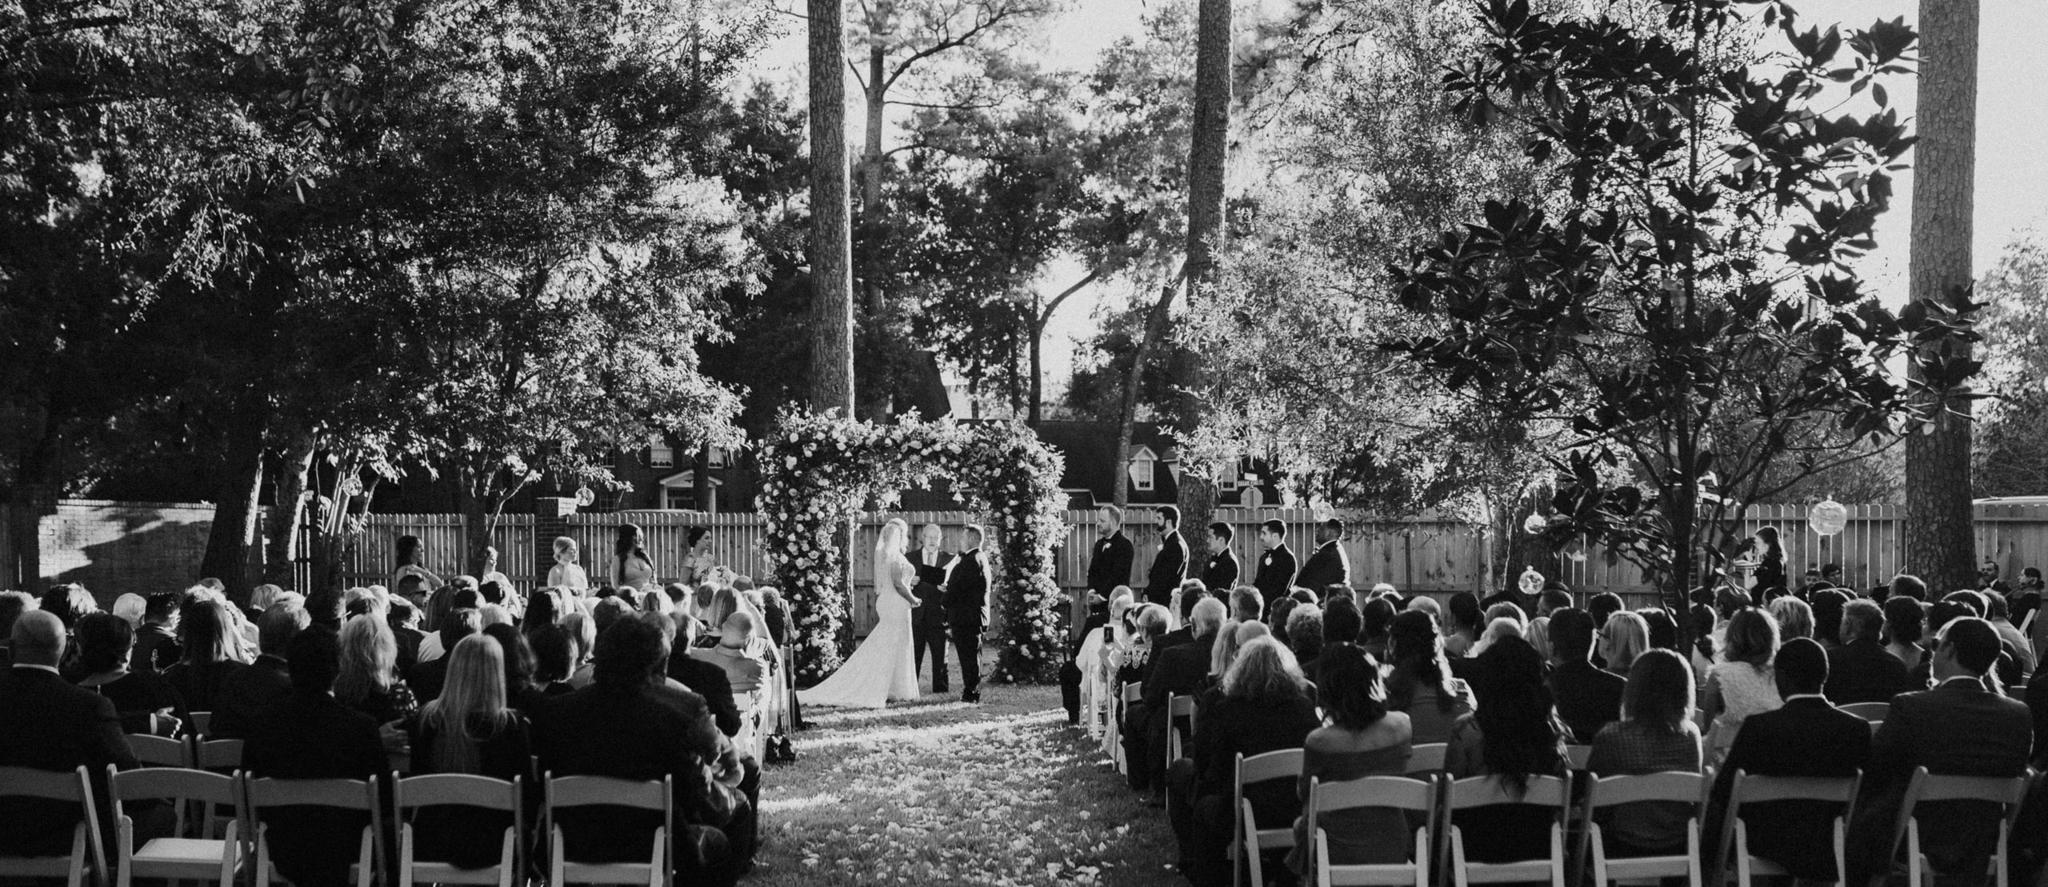 Houston Wedding Photographer-Intimate Texas Backyard Wedding- Houston Wedding Photographer -Kristen Giles Photography-46.jpg